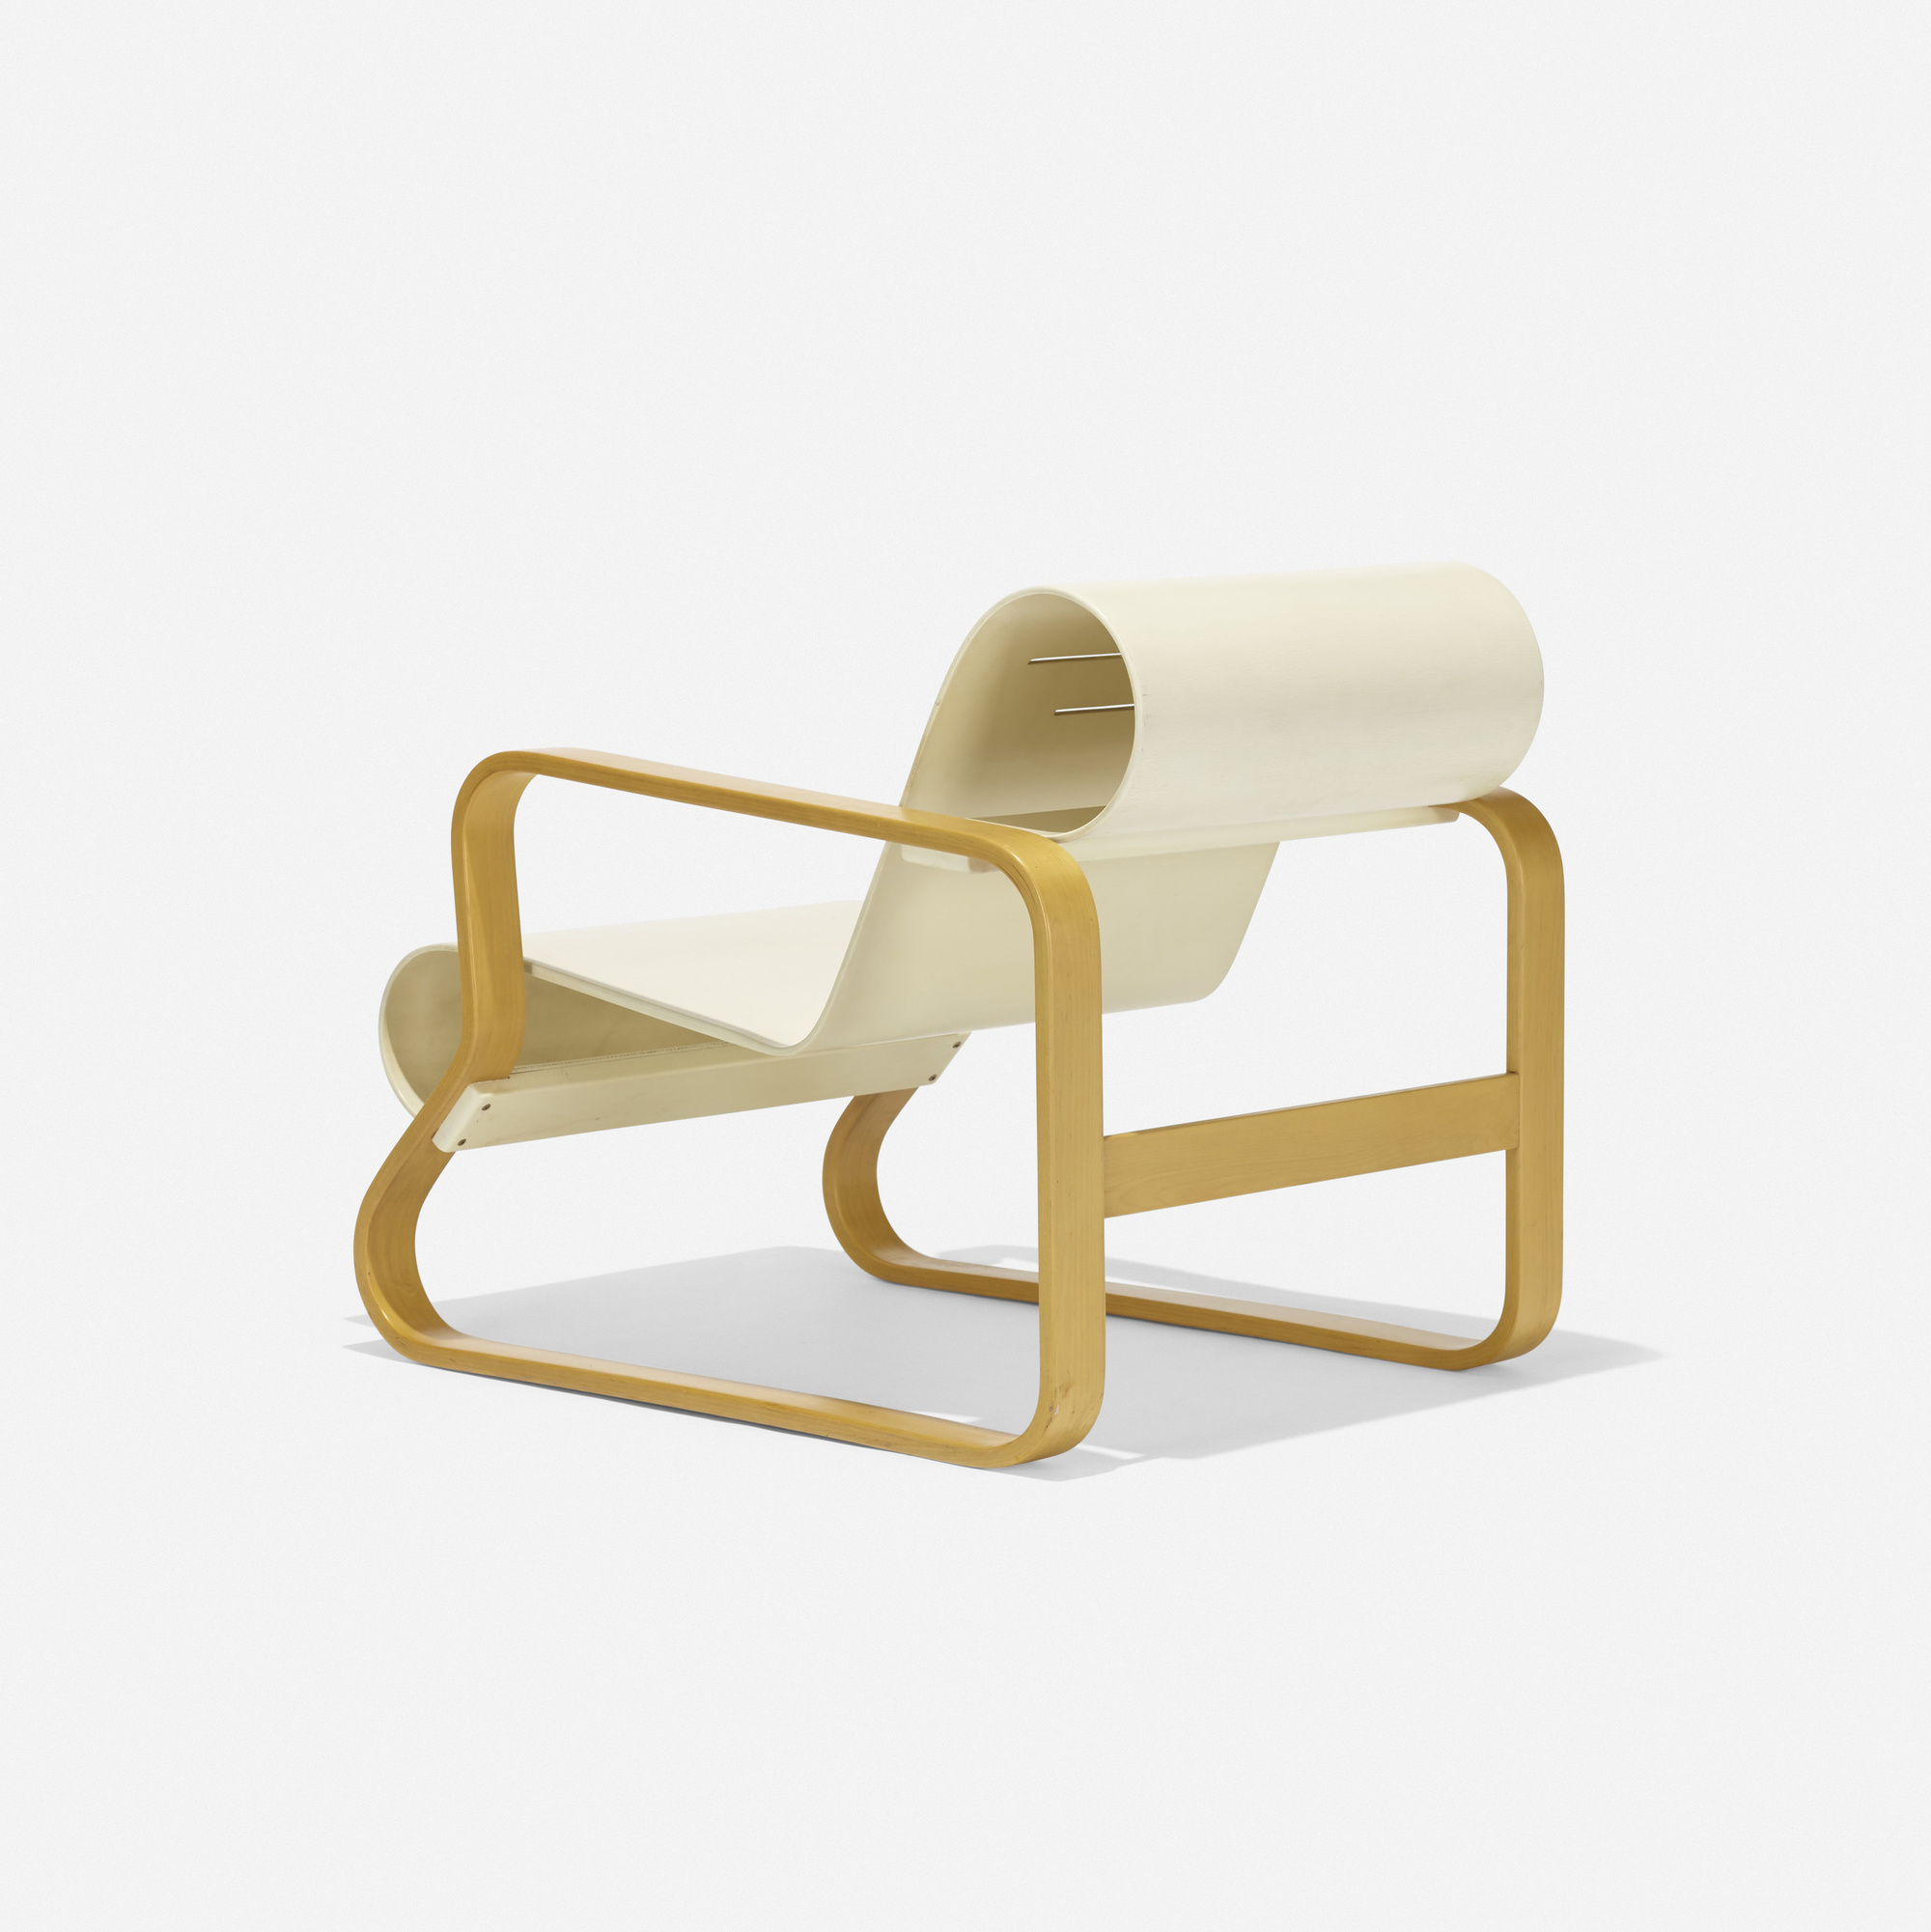 106: Alvar Aalto / Paimio lounge chair (2 of 2)